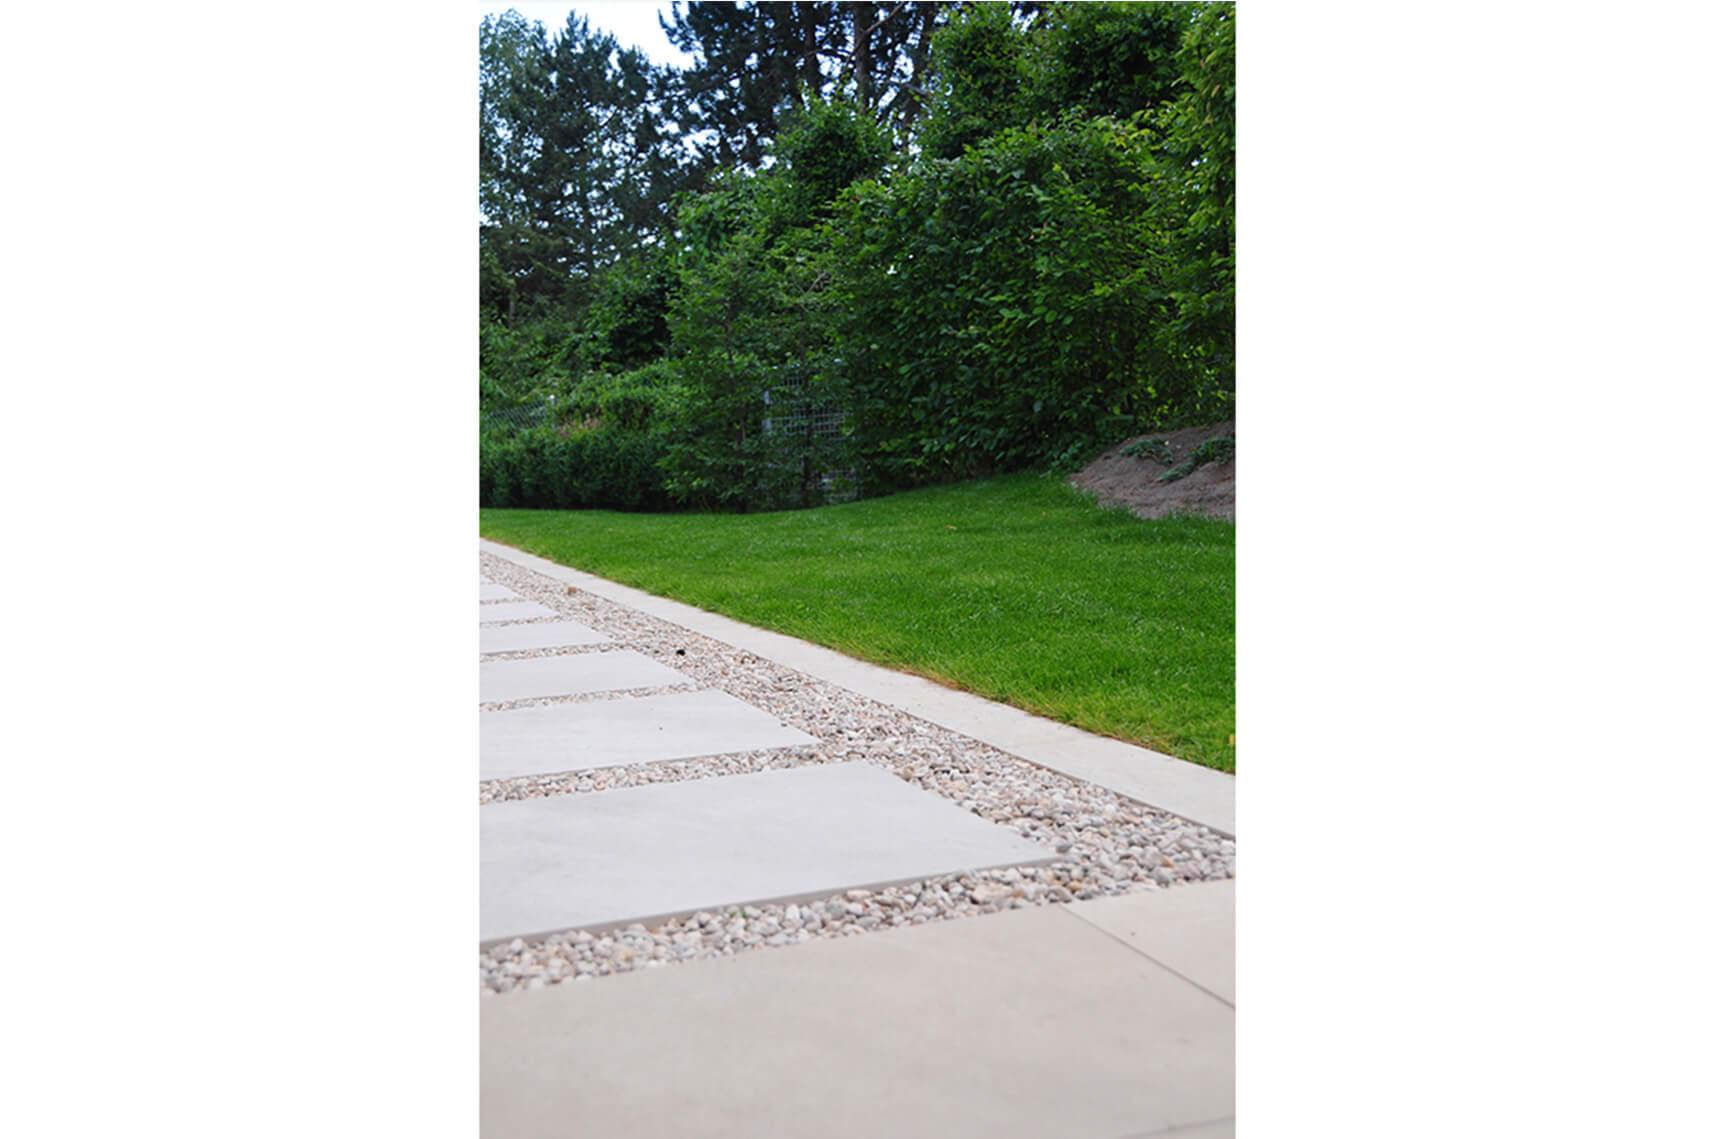 paysagiste tramelan villa terrasse jardin mur en pierres calcaires aellig paysages (9)